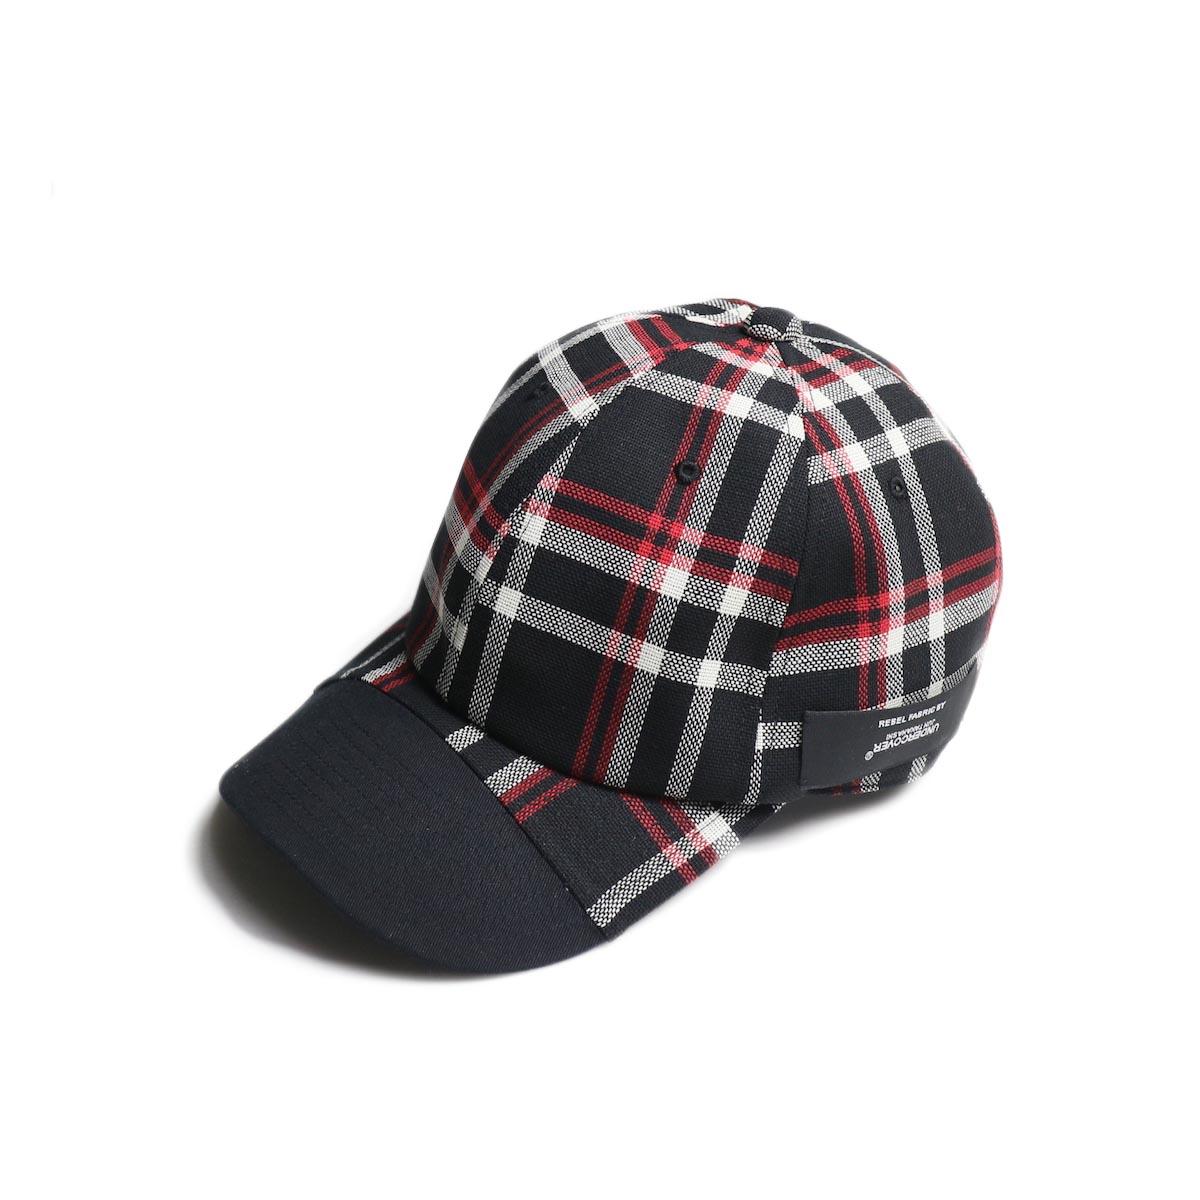 N.HOOLYWOOD / 1201-AC08 6P Check Cap  (Bk Check)